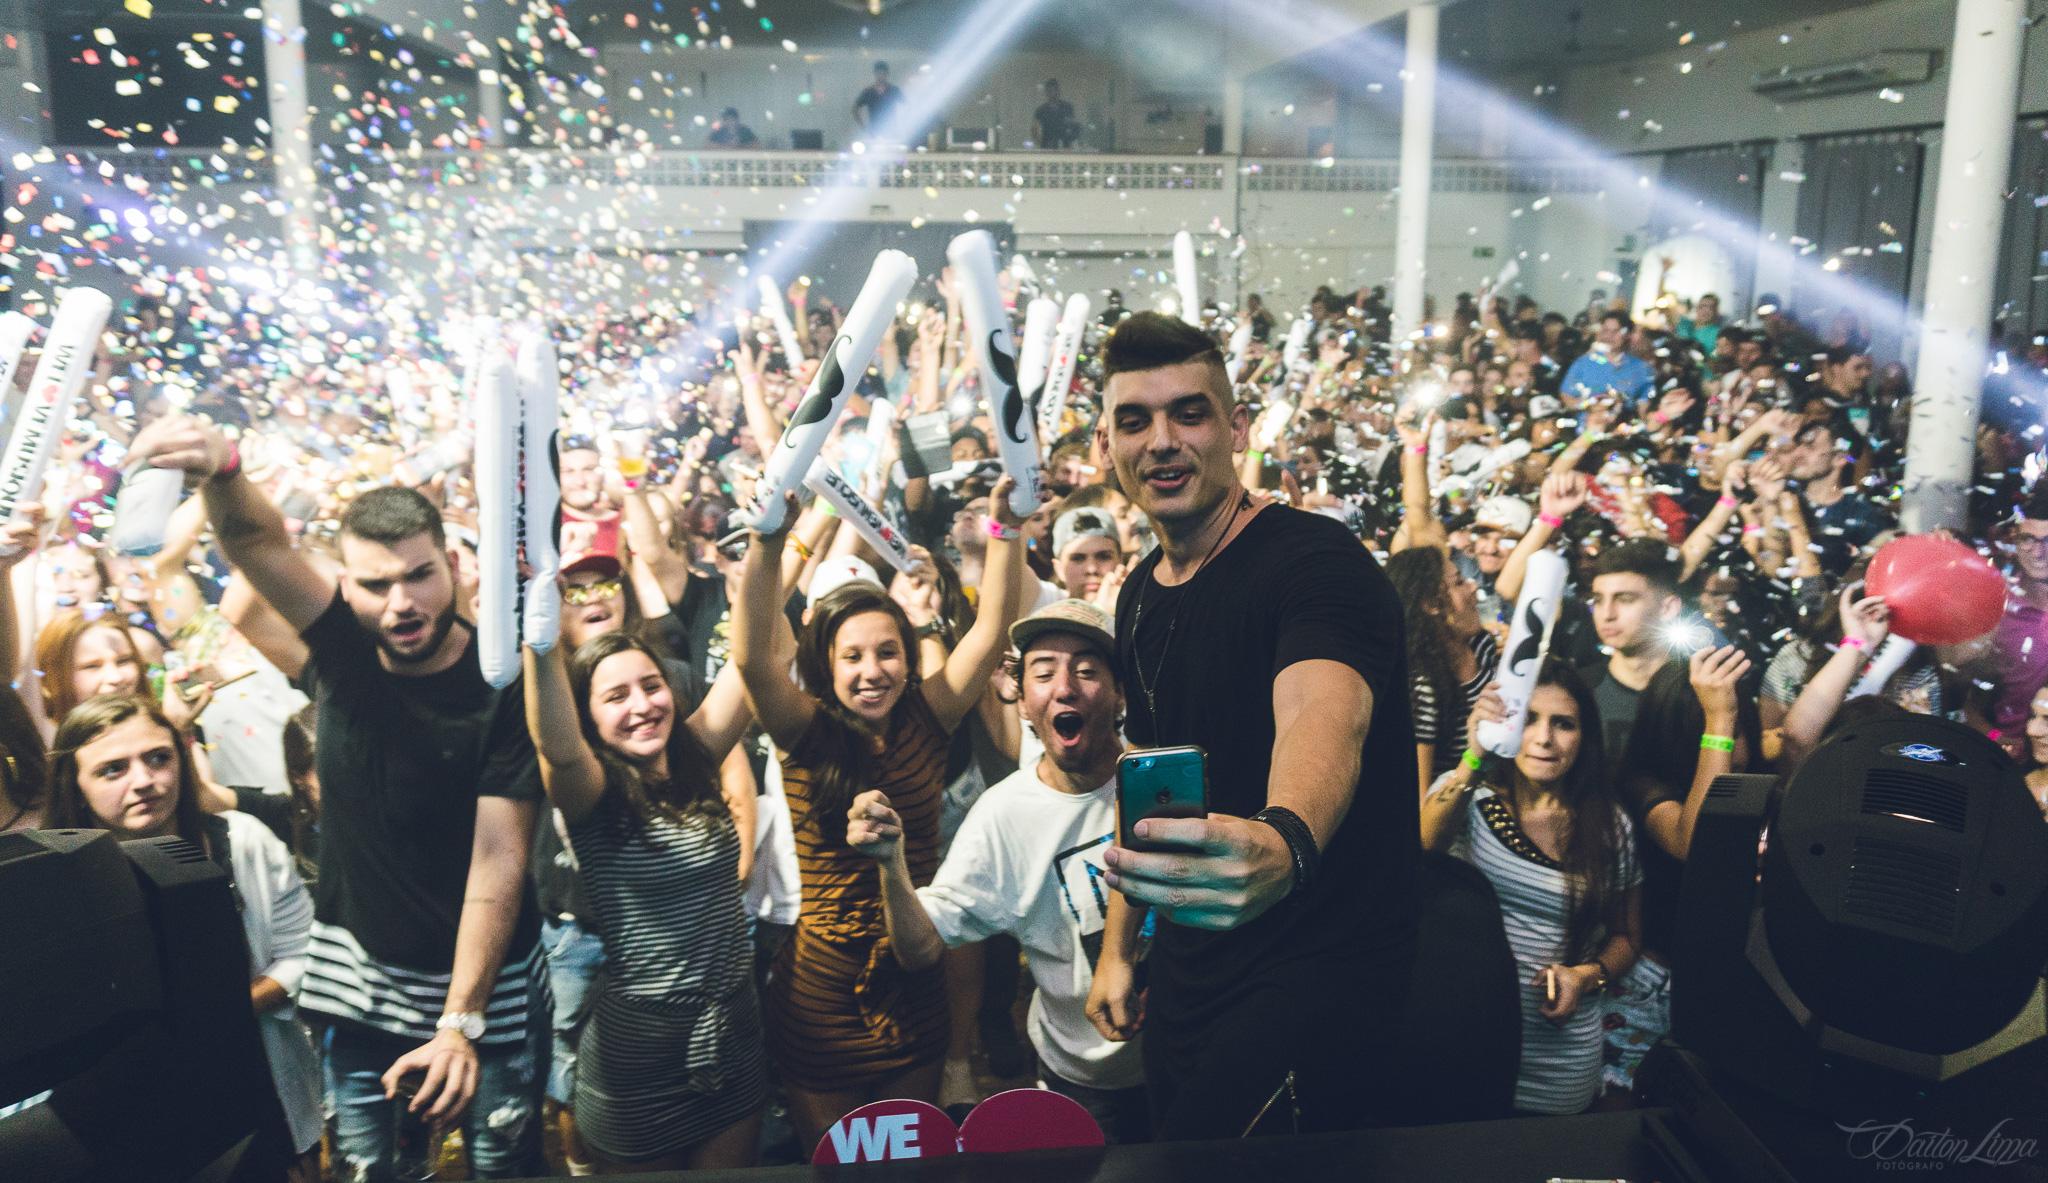 WE LOVE MUSIQUE EDIÇÃO TAQUARI - DJ DANNI MARTIN